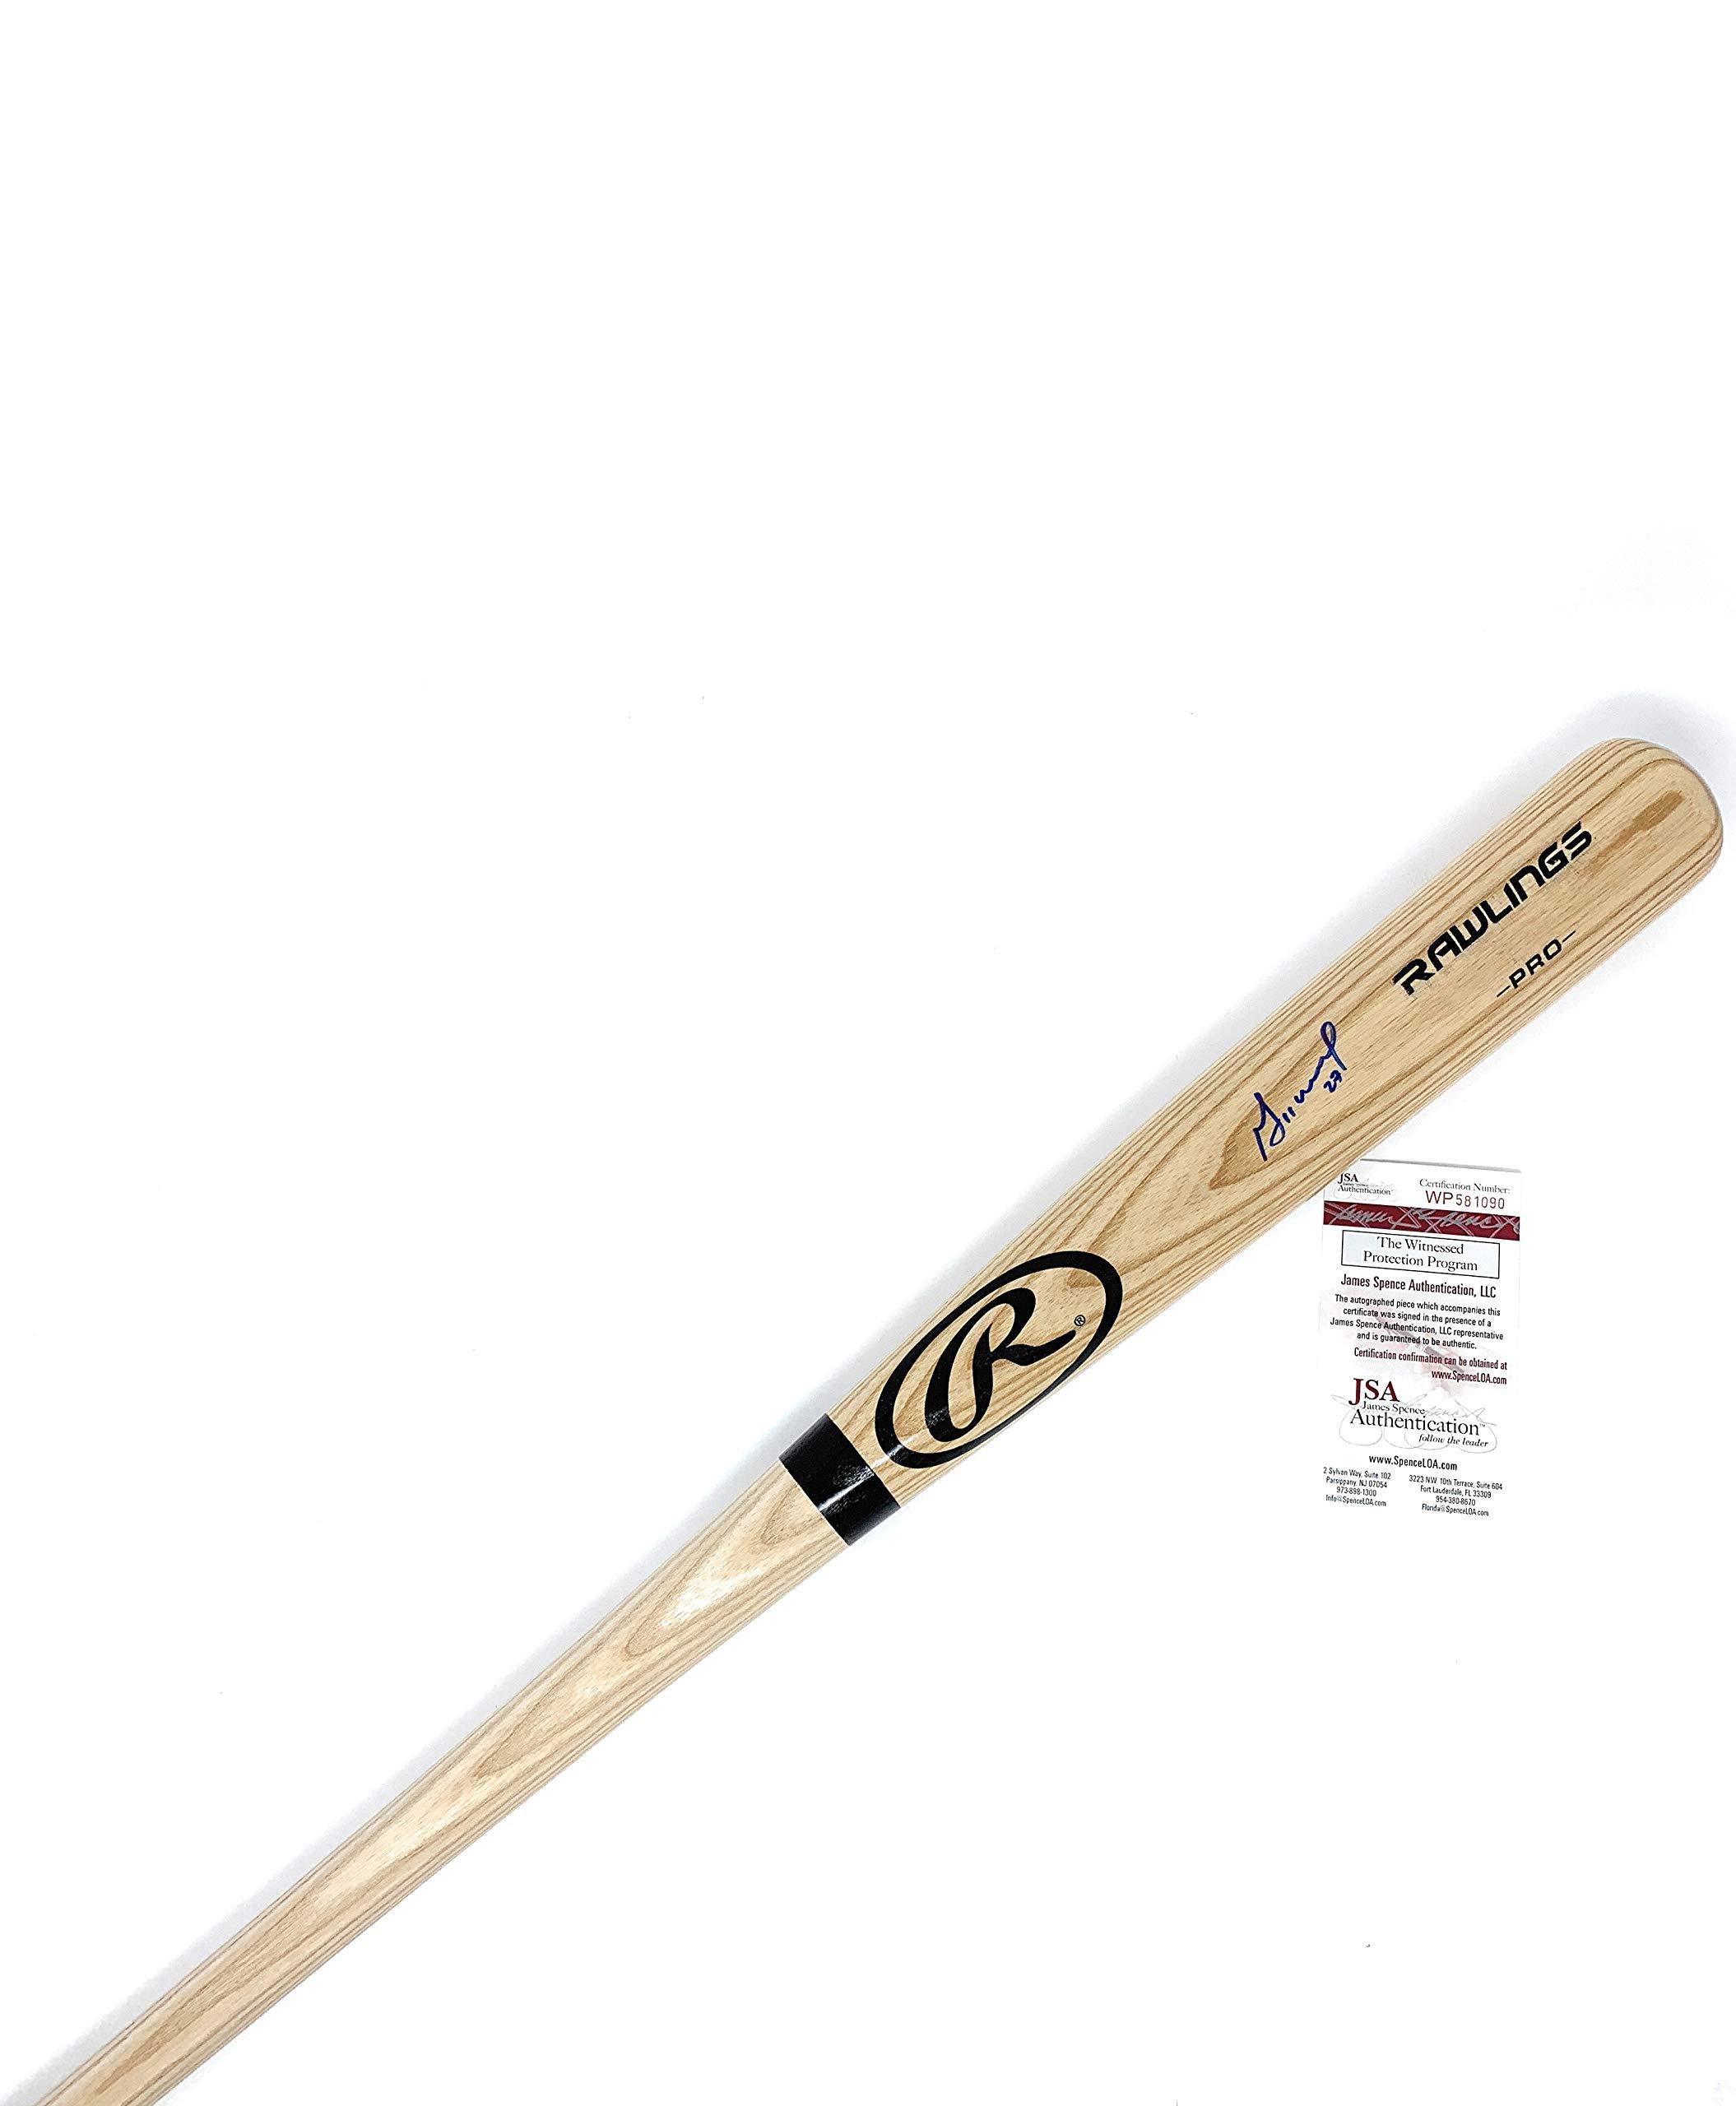 Jose Altuve Houston Astros Signed Autograph Baseball Bat Altuve GTSM Holo JSA Witnessed Certified